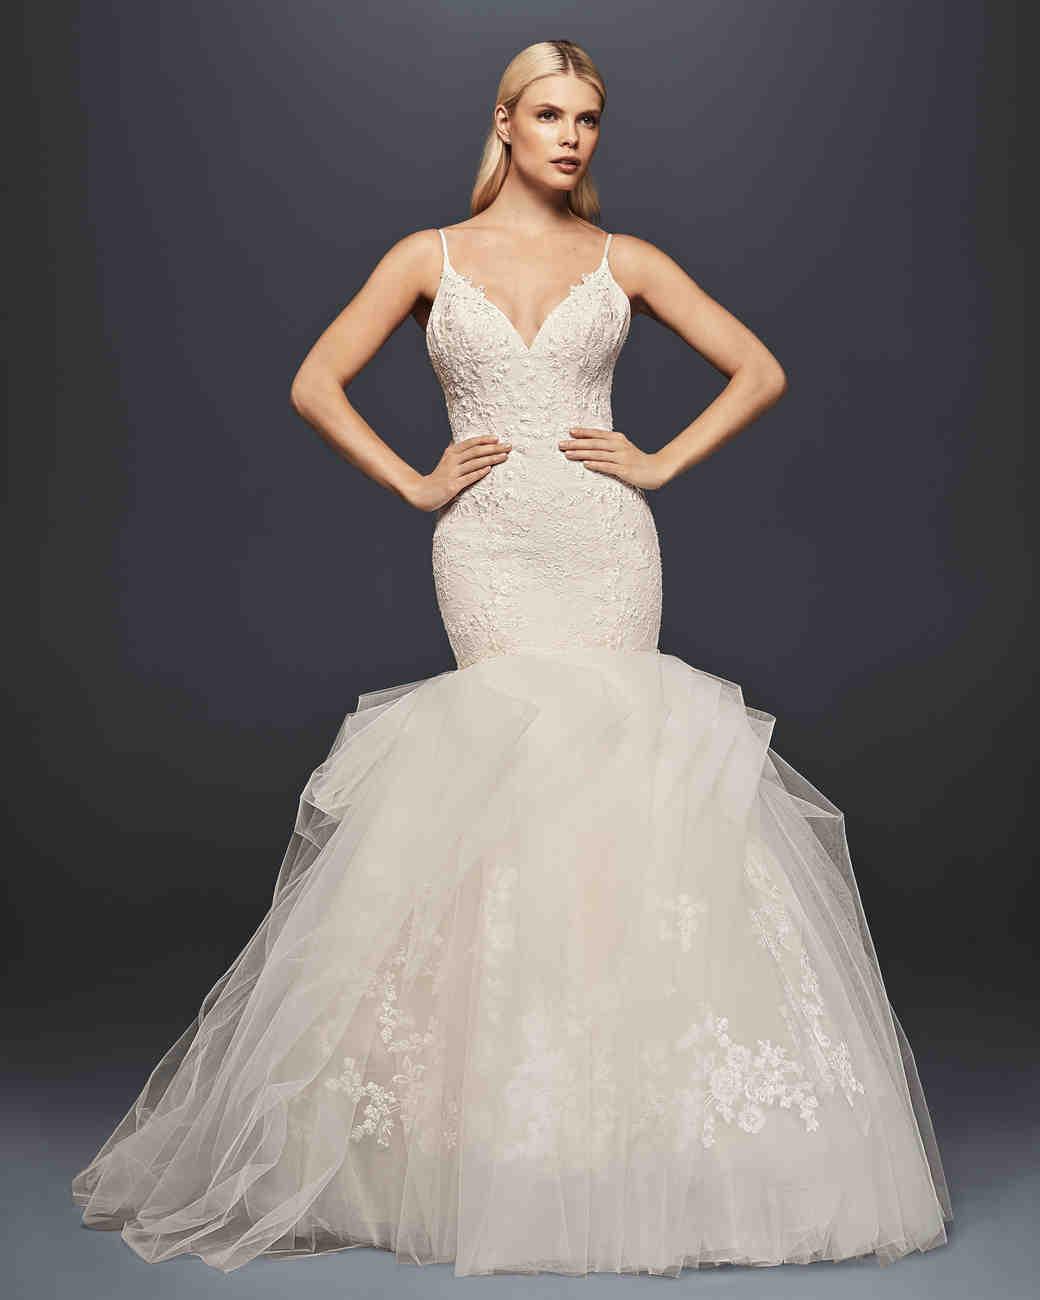 spring wedding dress trends best wedding dress Truly Zac Posen Spring Wedding Dress Collection